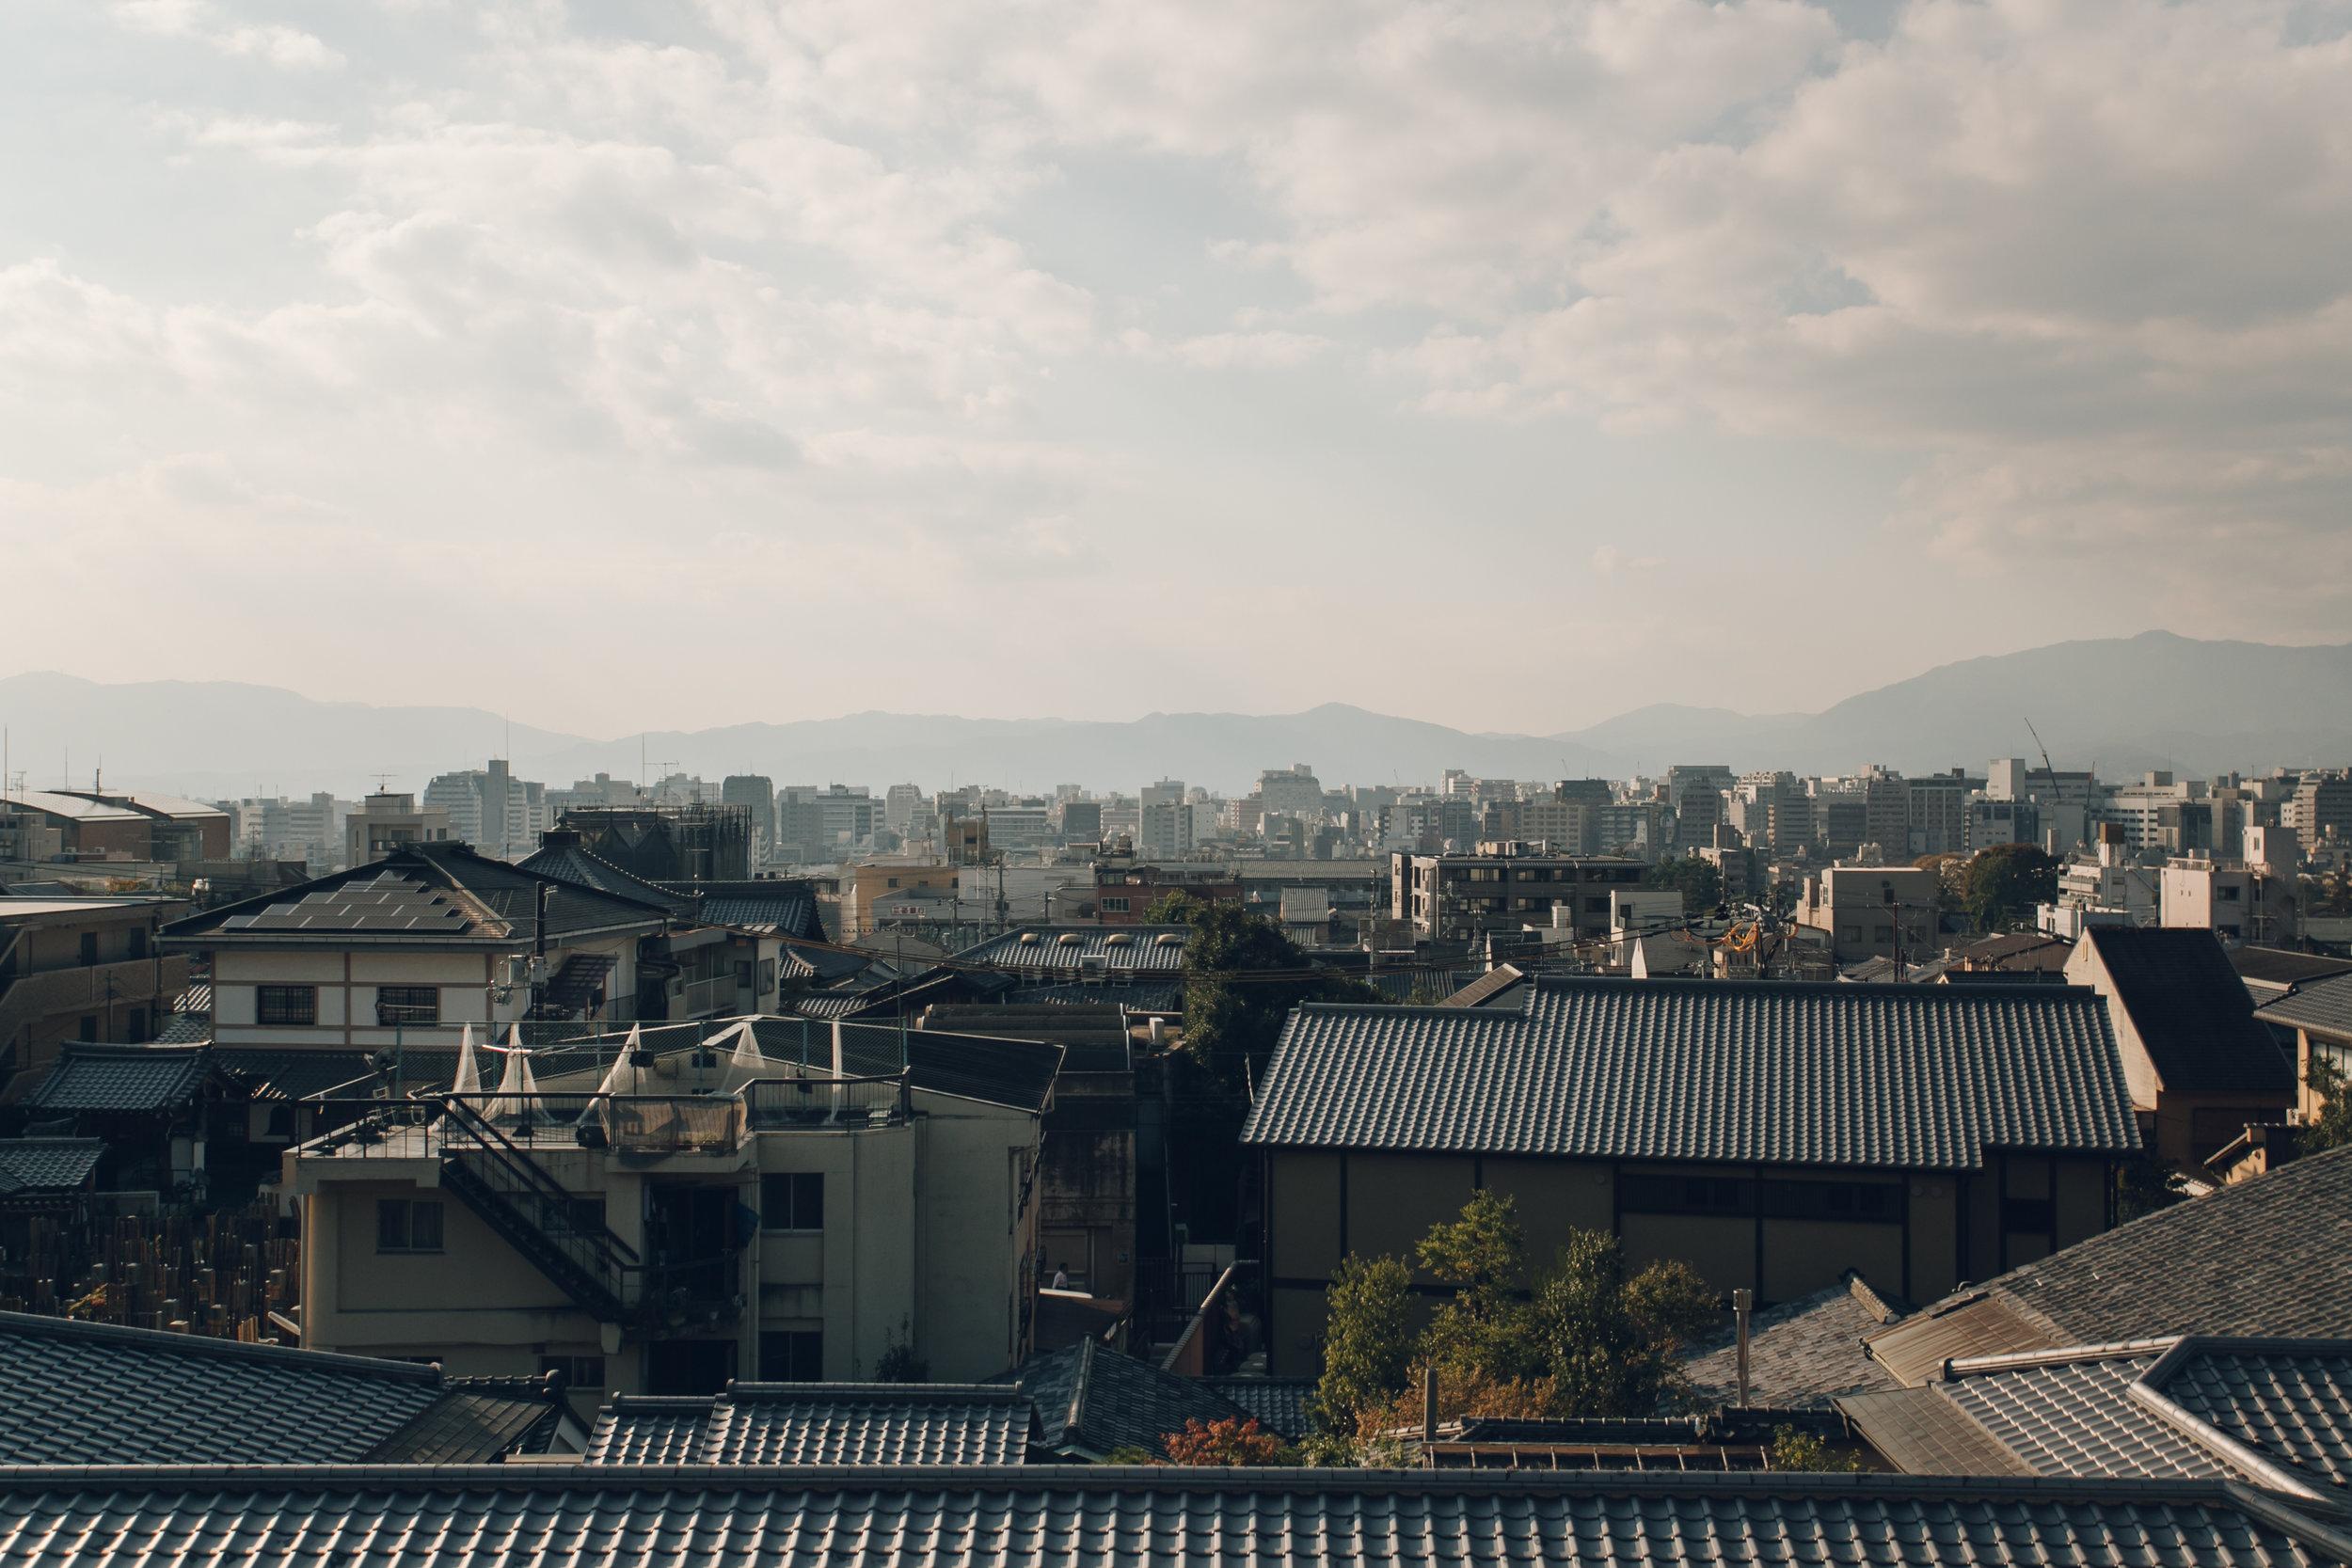 Concrete Airbnb in Kyoto - Haarkon in Japan.